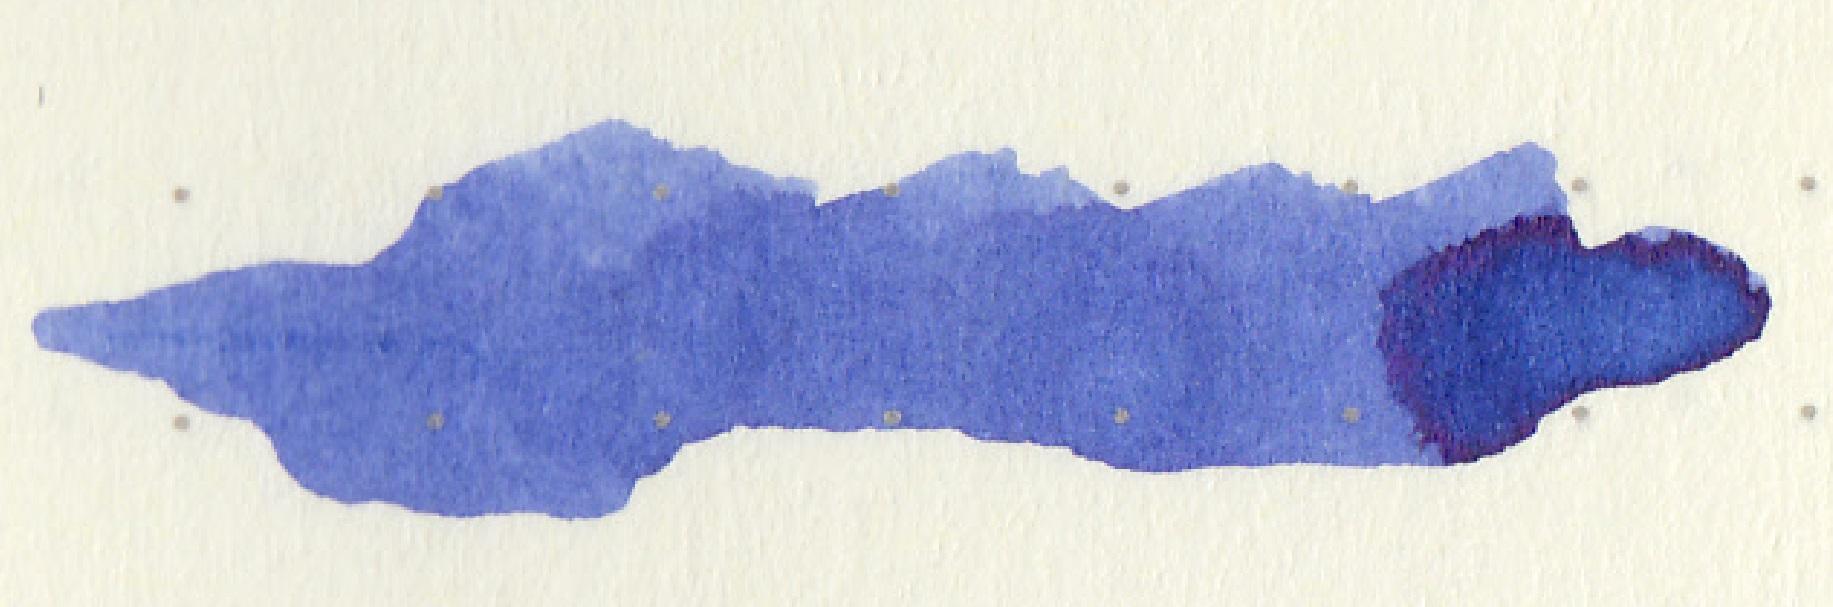 fpn_1500791587__blue_aurora_l_5.jpg